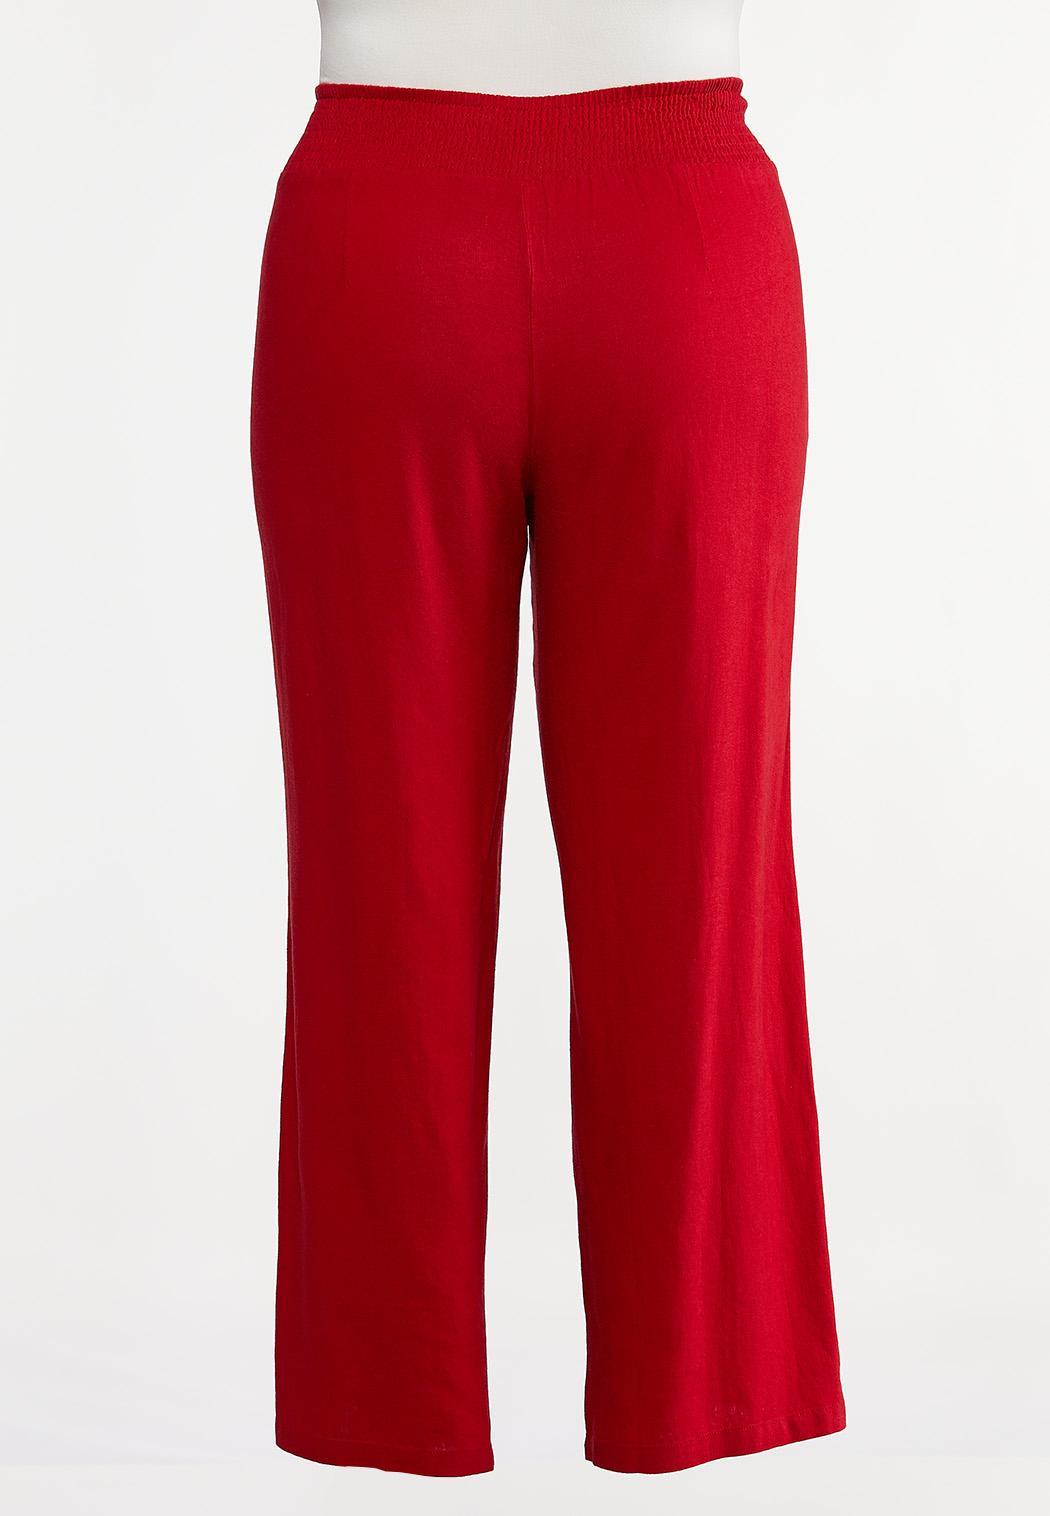 Plus Size Red Linen Beach Pants (Item #44257382)